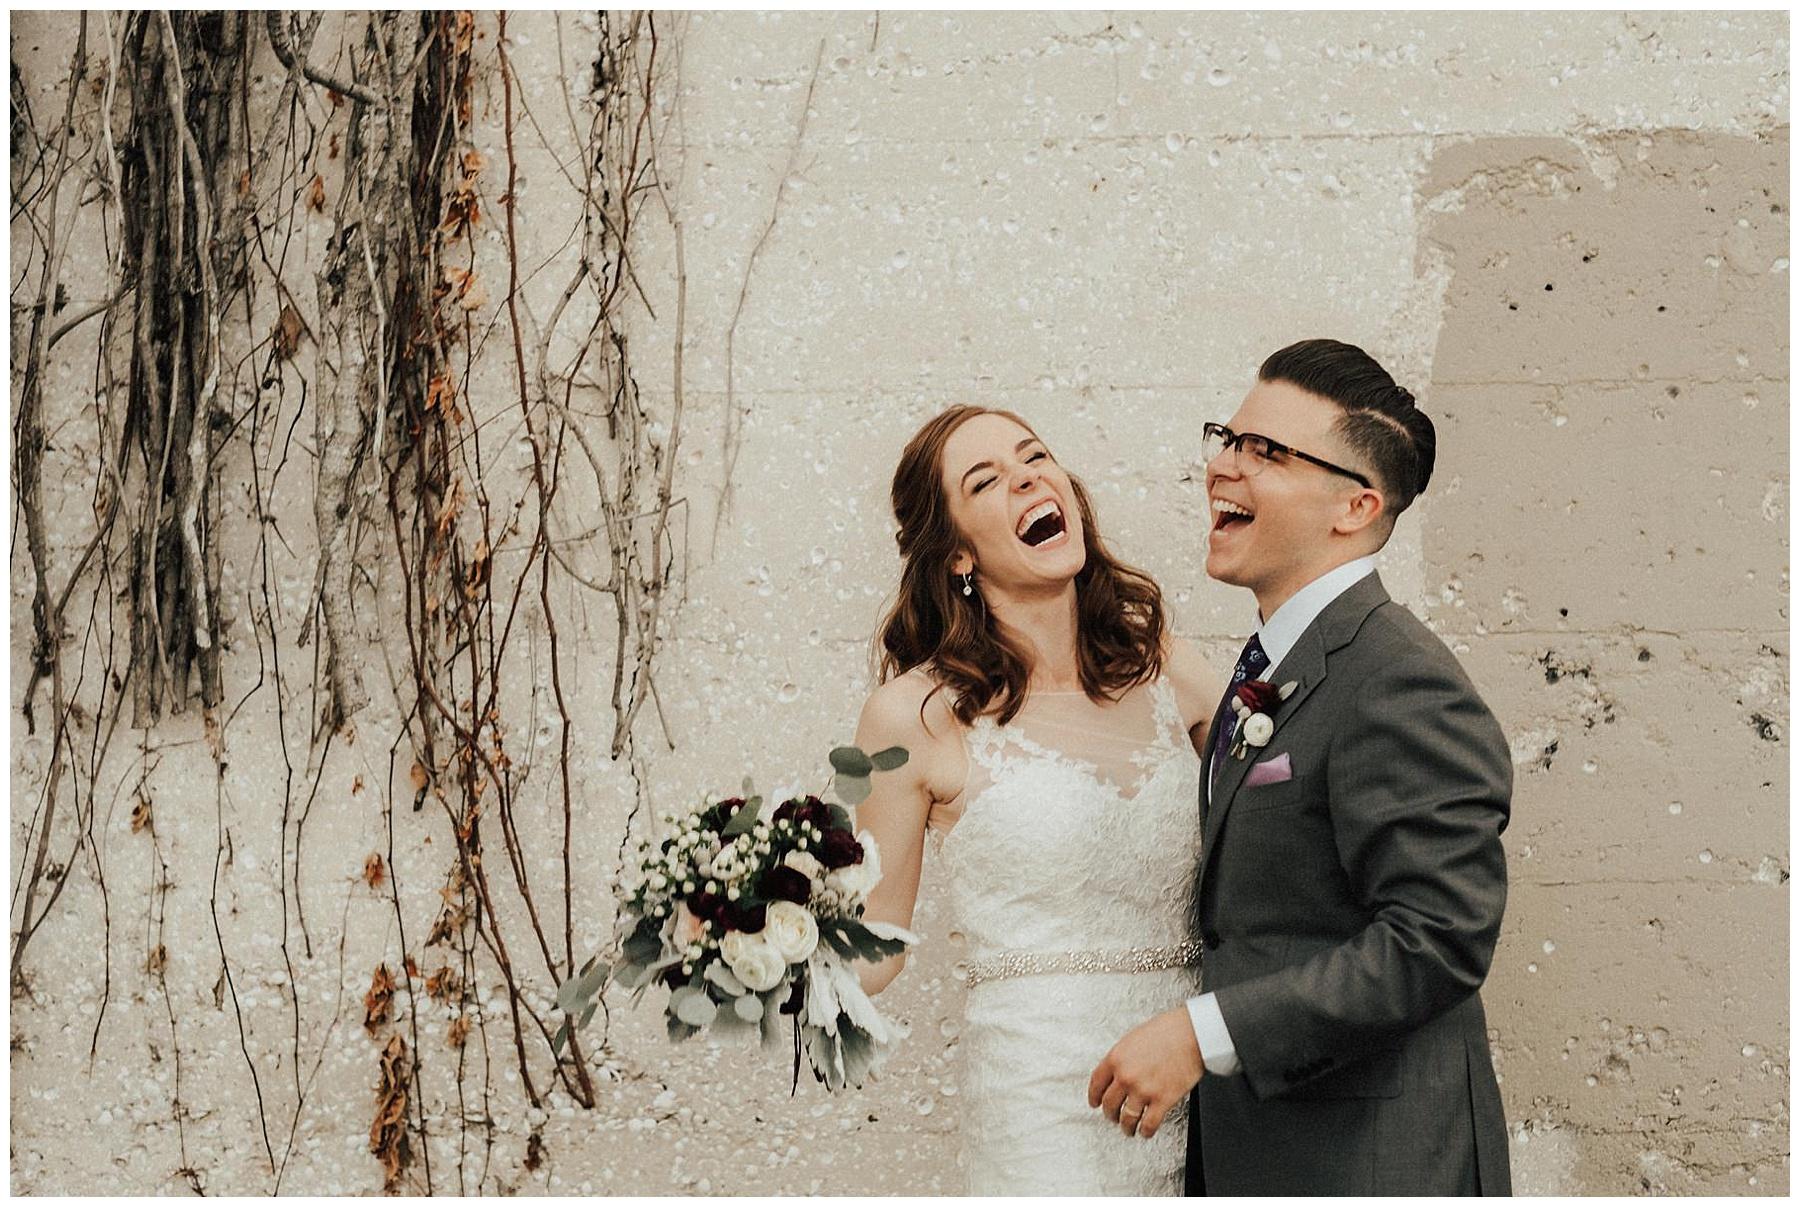 Kylie Garden Wedding Tampa Wedding Photographer-115.jpg